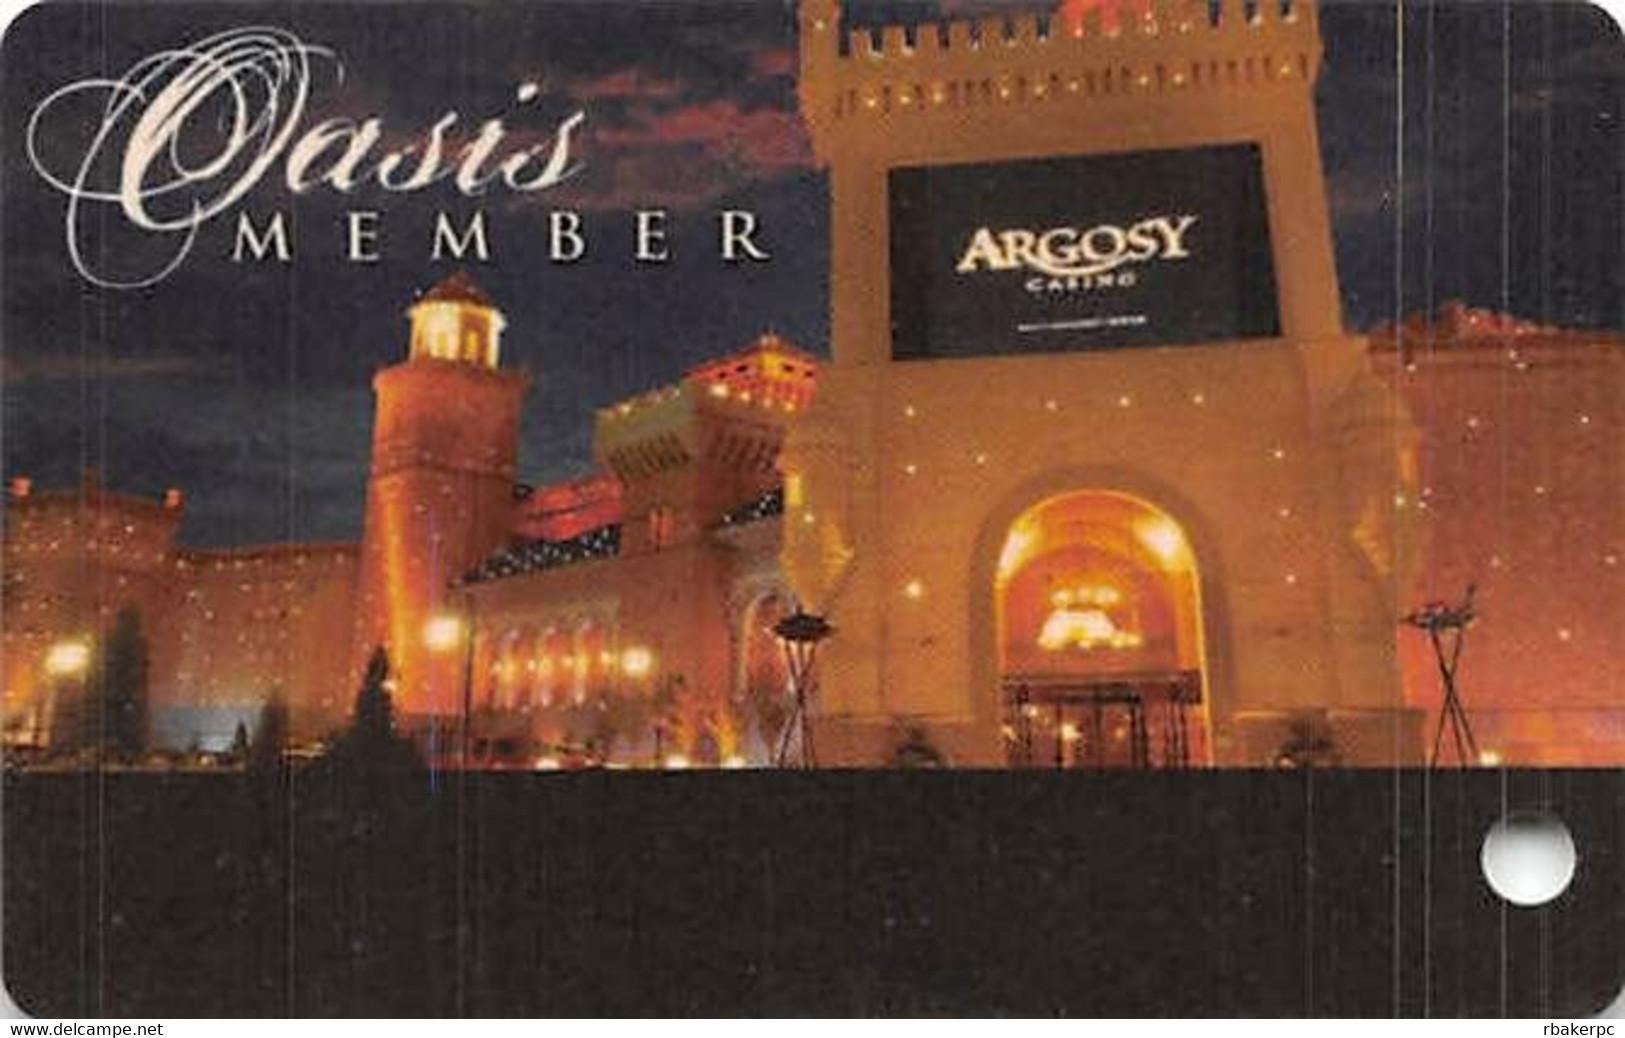 Argosy Casino - Riverside, MO USA - BLANK Oasis Member Slot Card - Casino Cards